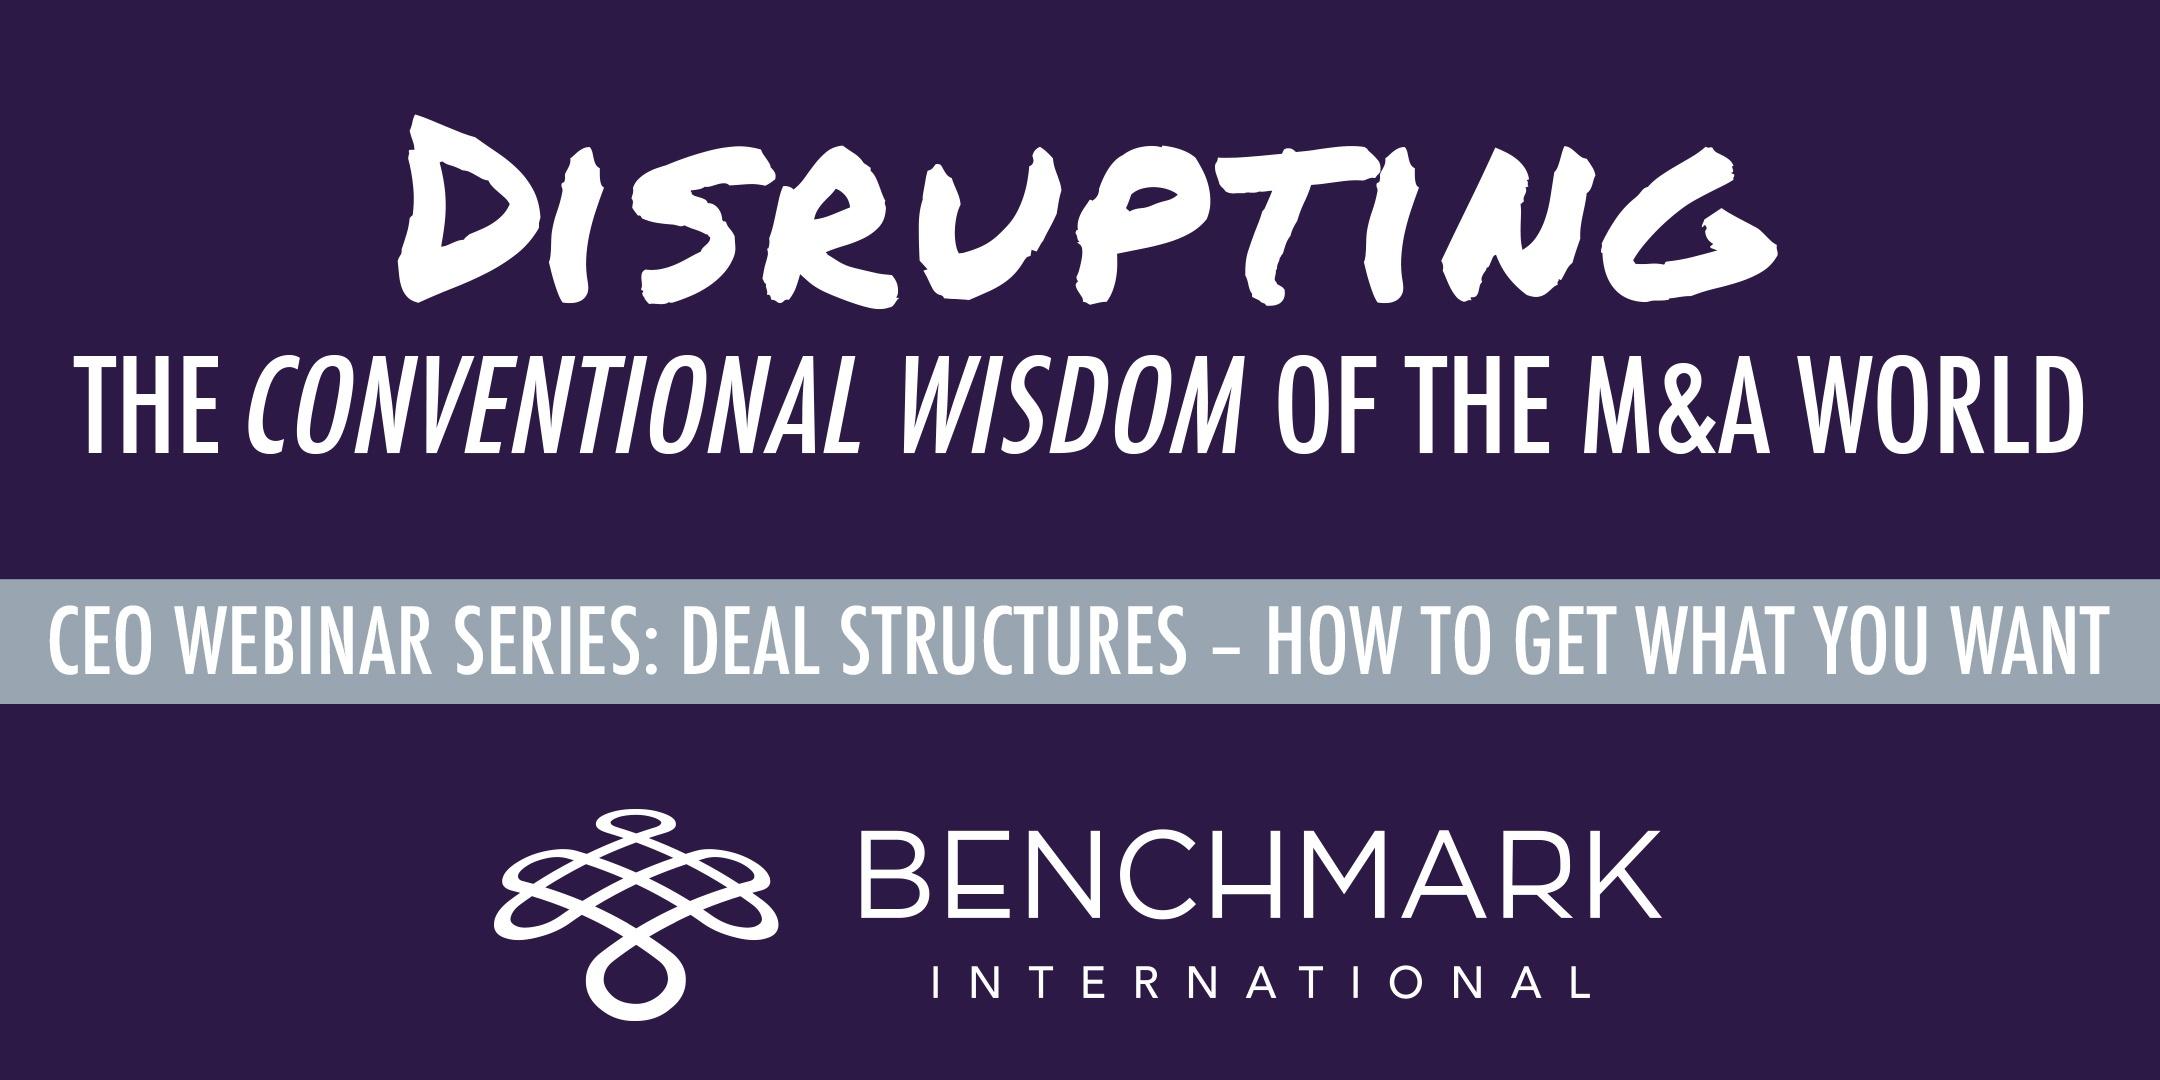 Benchmark International Blog